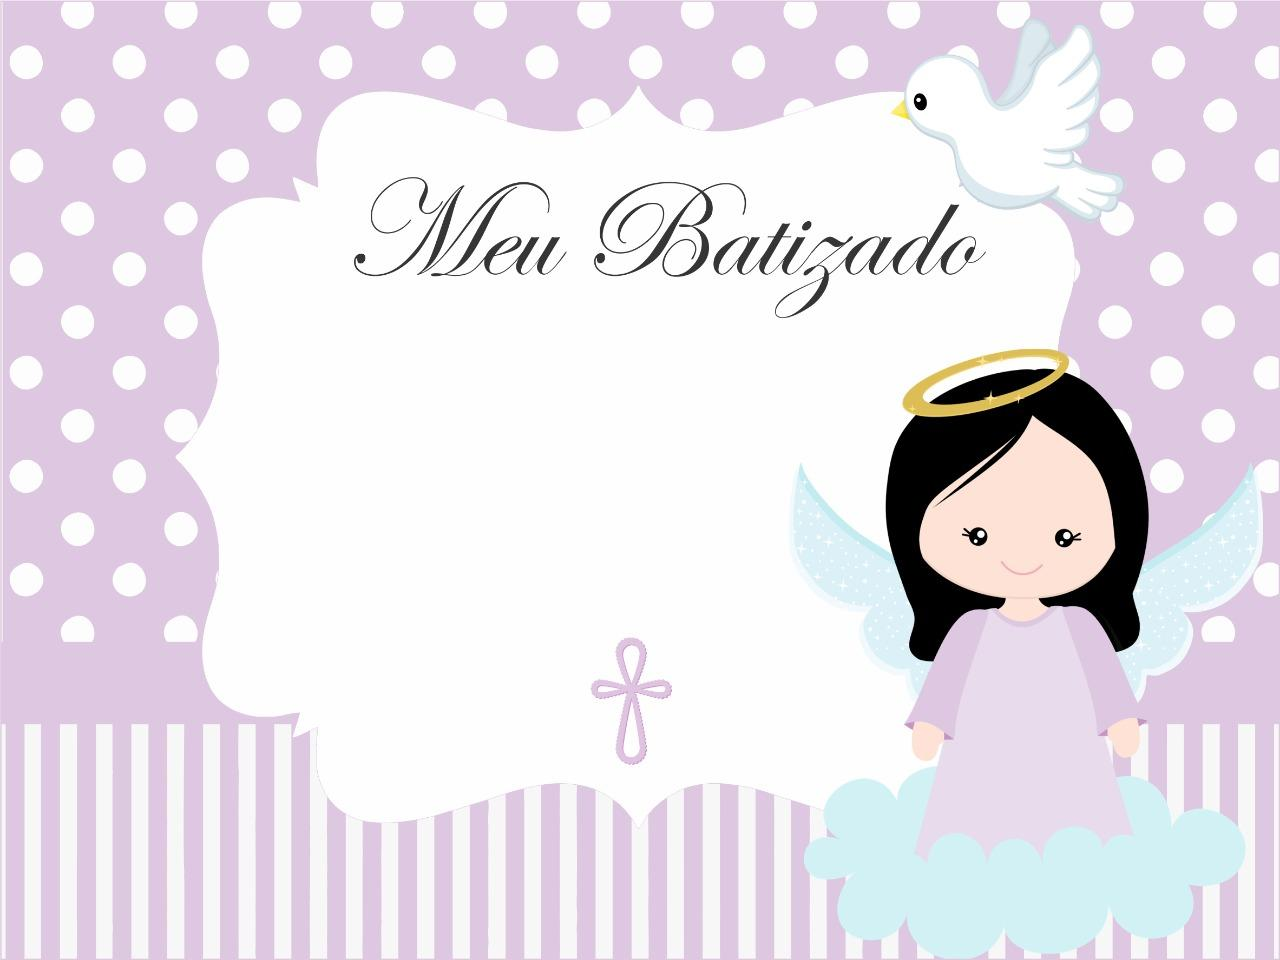 convite batizado feminino